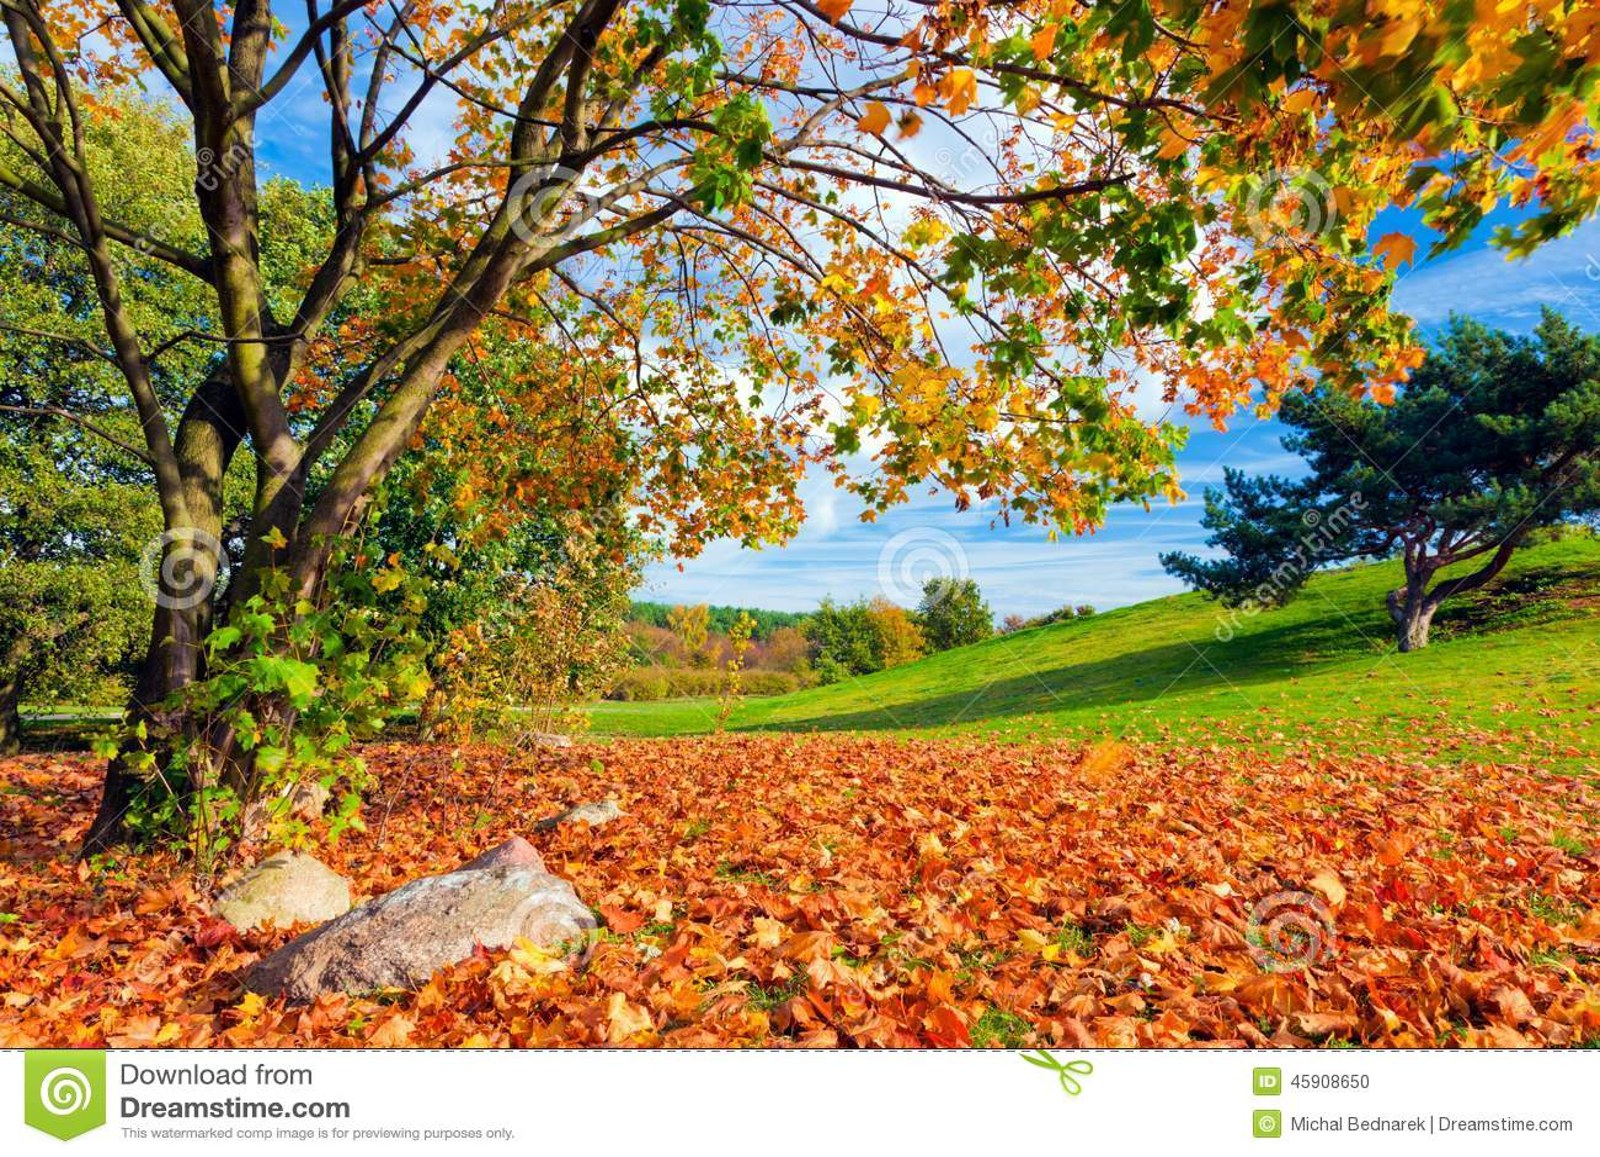 autumn fall tree backgrounds - photo #7